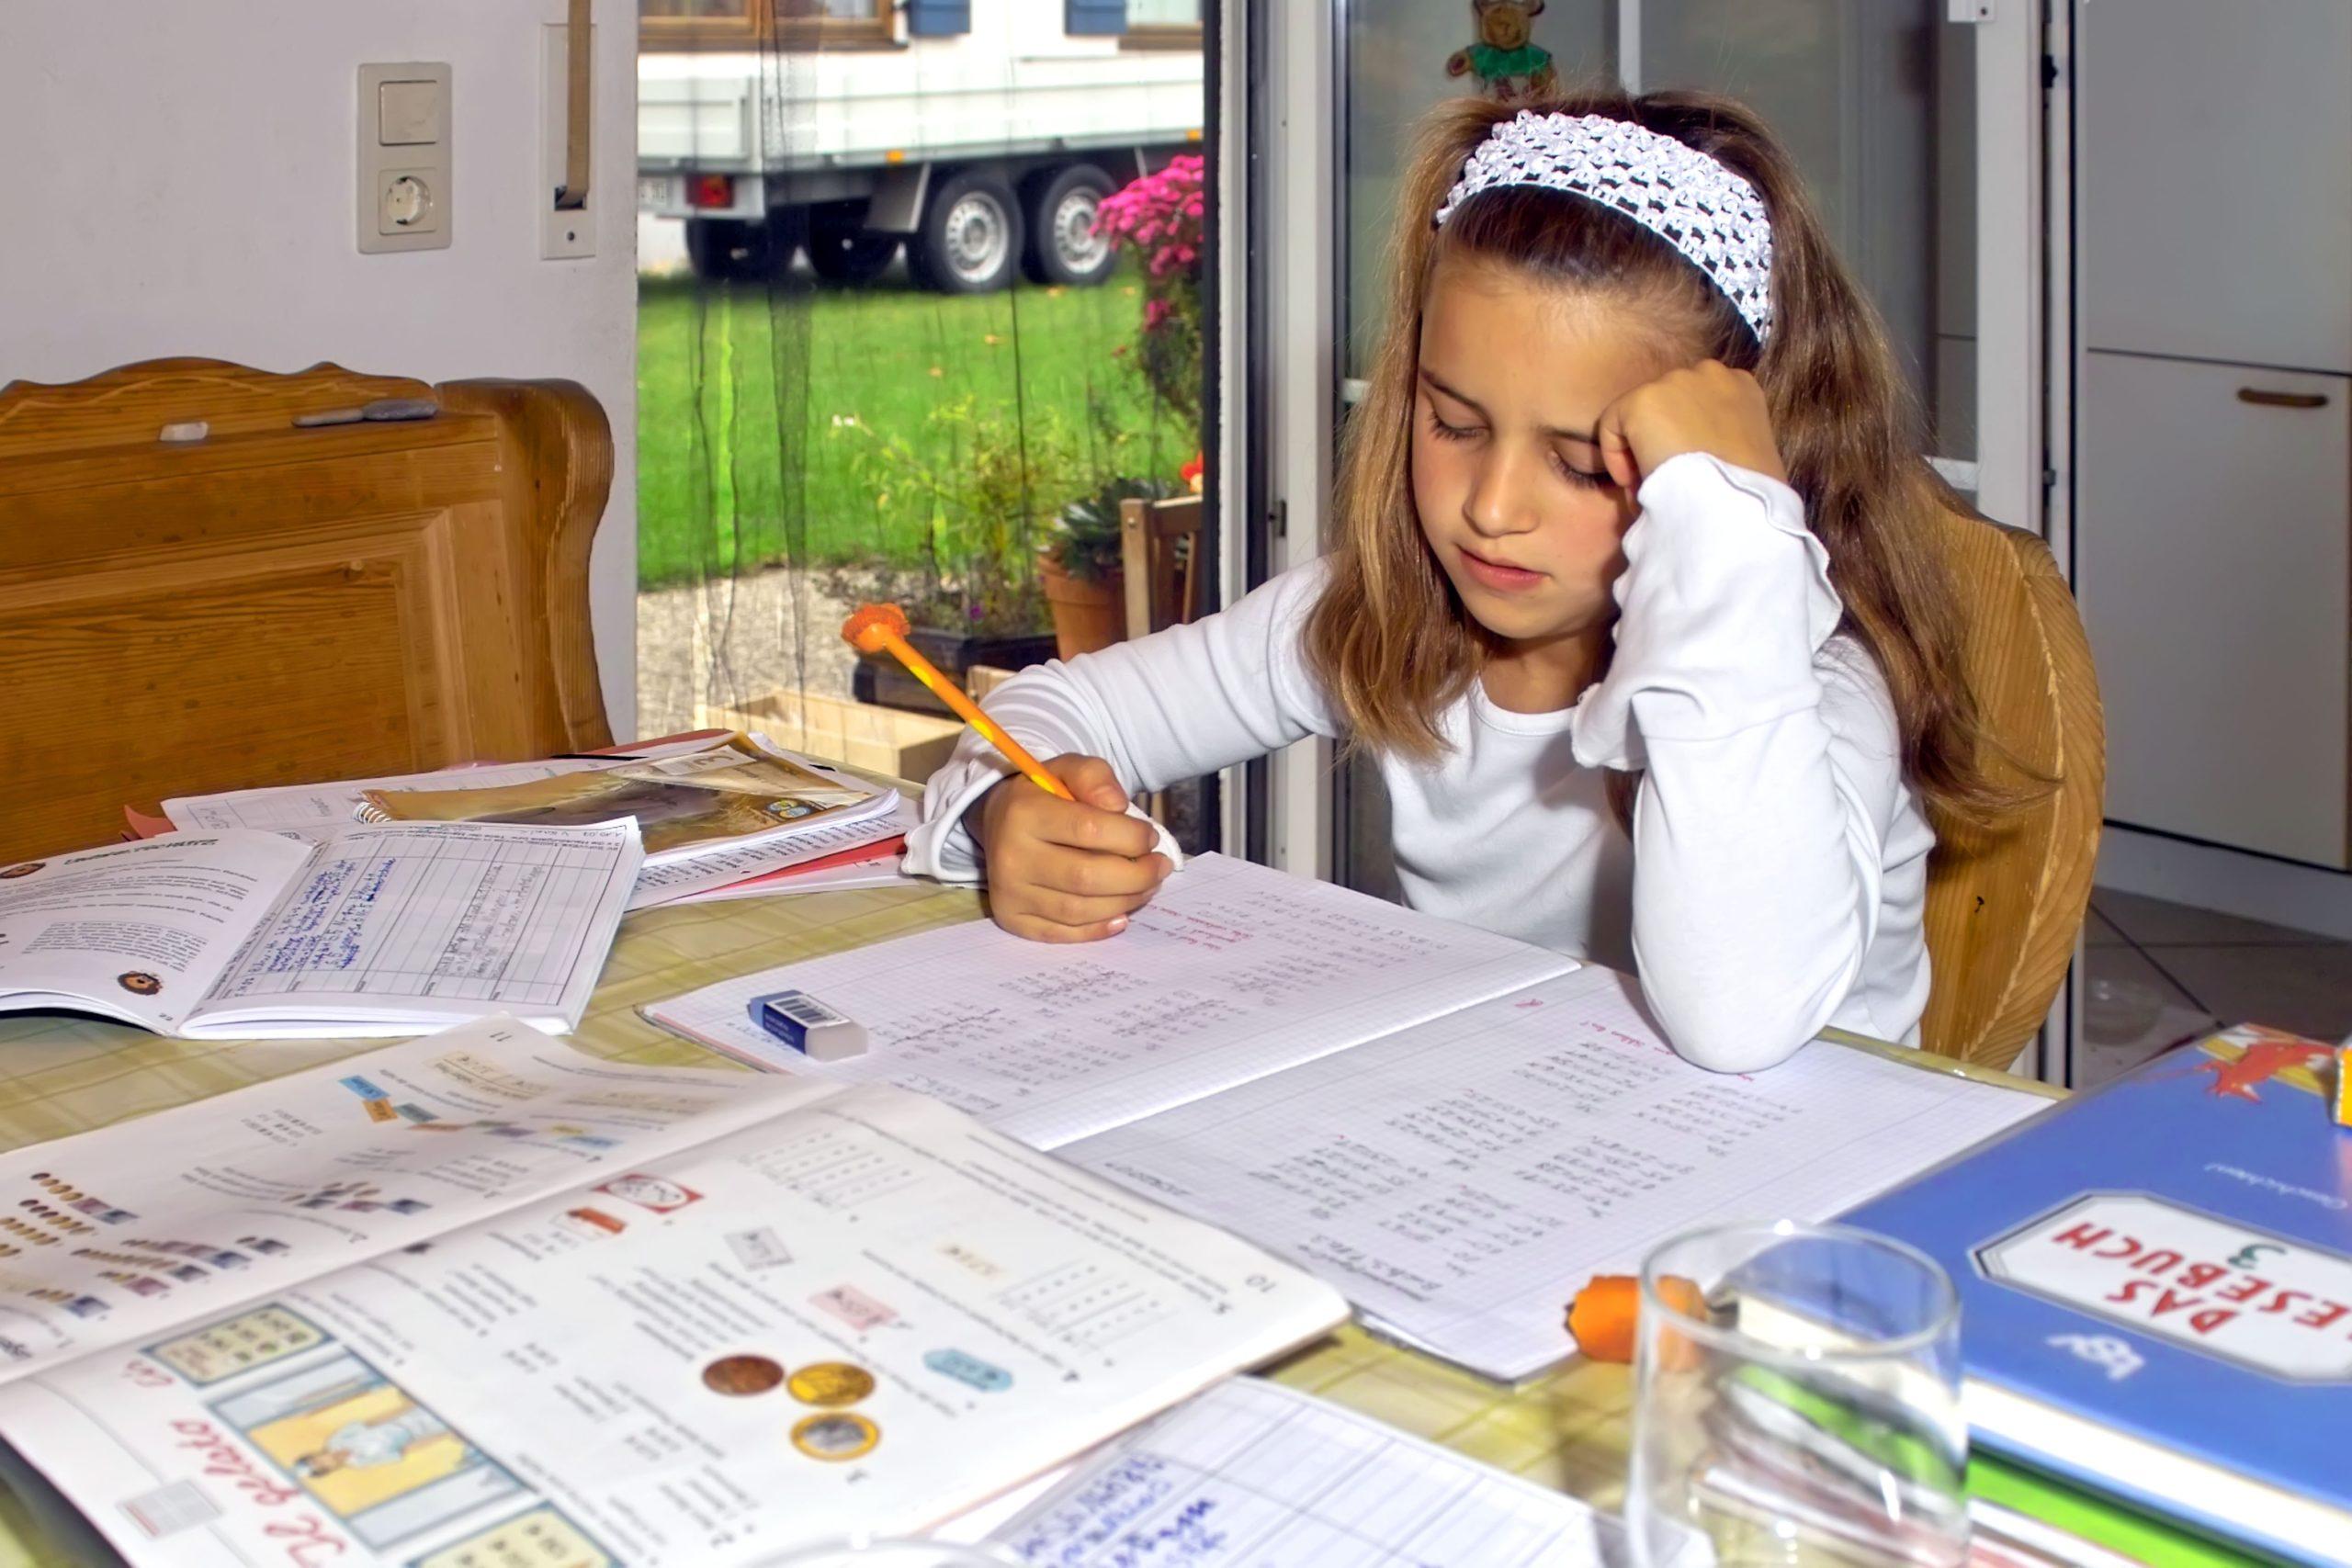 Neurofibromatose Lernstörung Lernförderung NF1 Kinder Jugendliche Lernserver